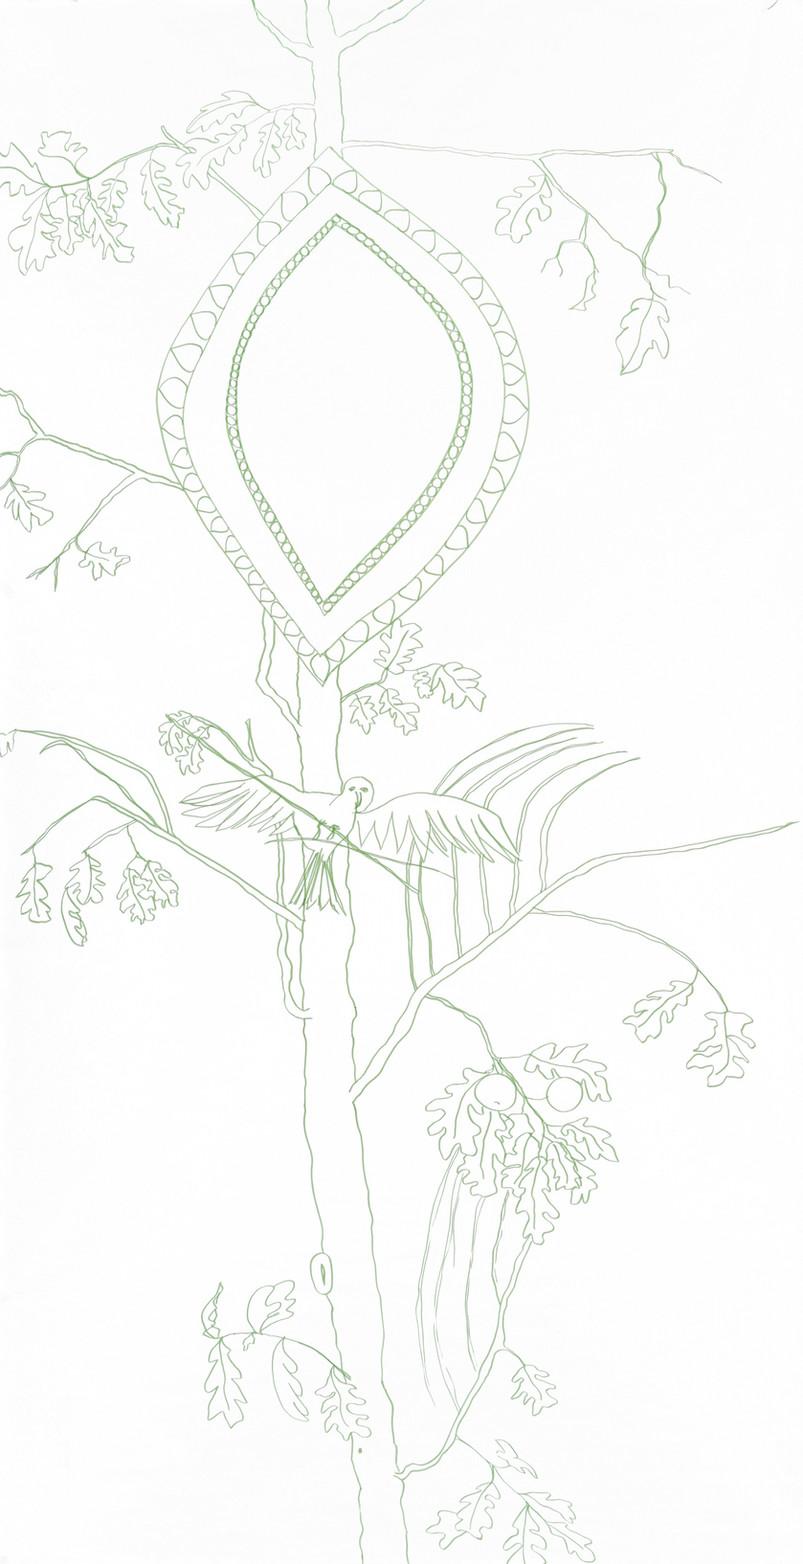 """eichenklar"", felt pen on paper, 235 x 120 cm, 2015"